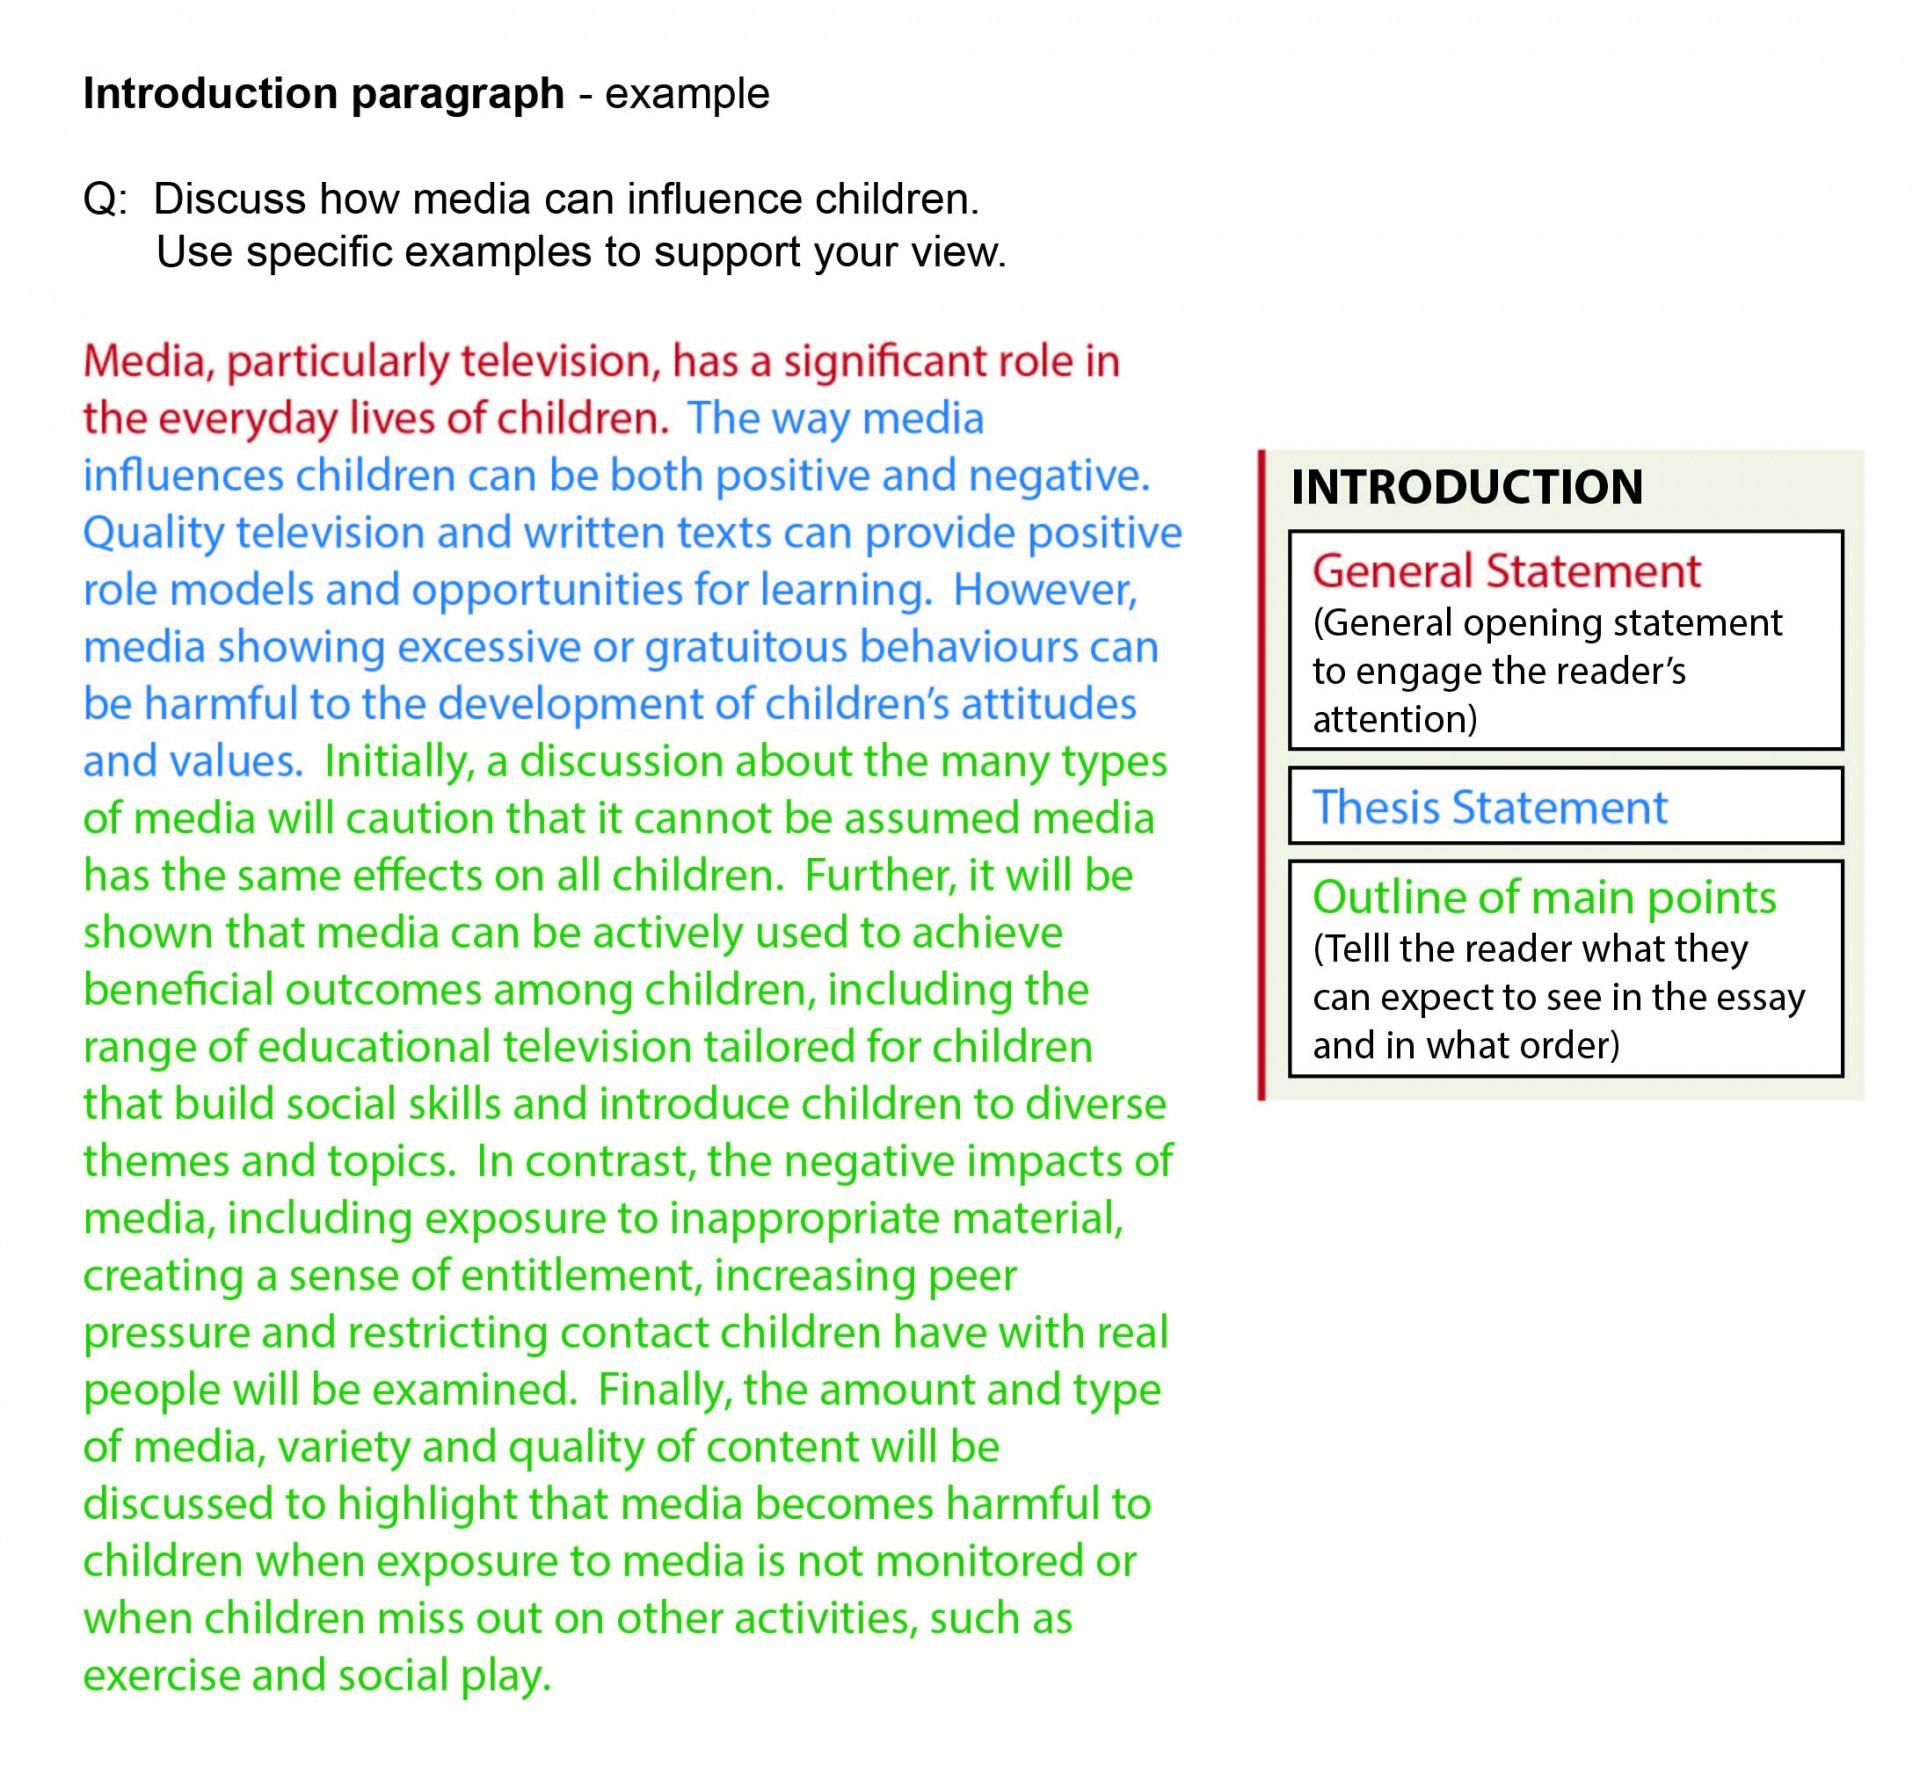 004 Essay Introduction Samples Example Frightening Sample Tagalog Argumentative Format Template 1920